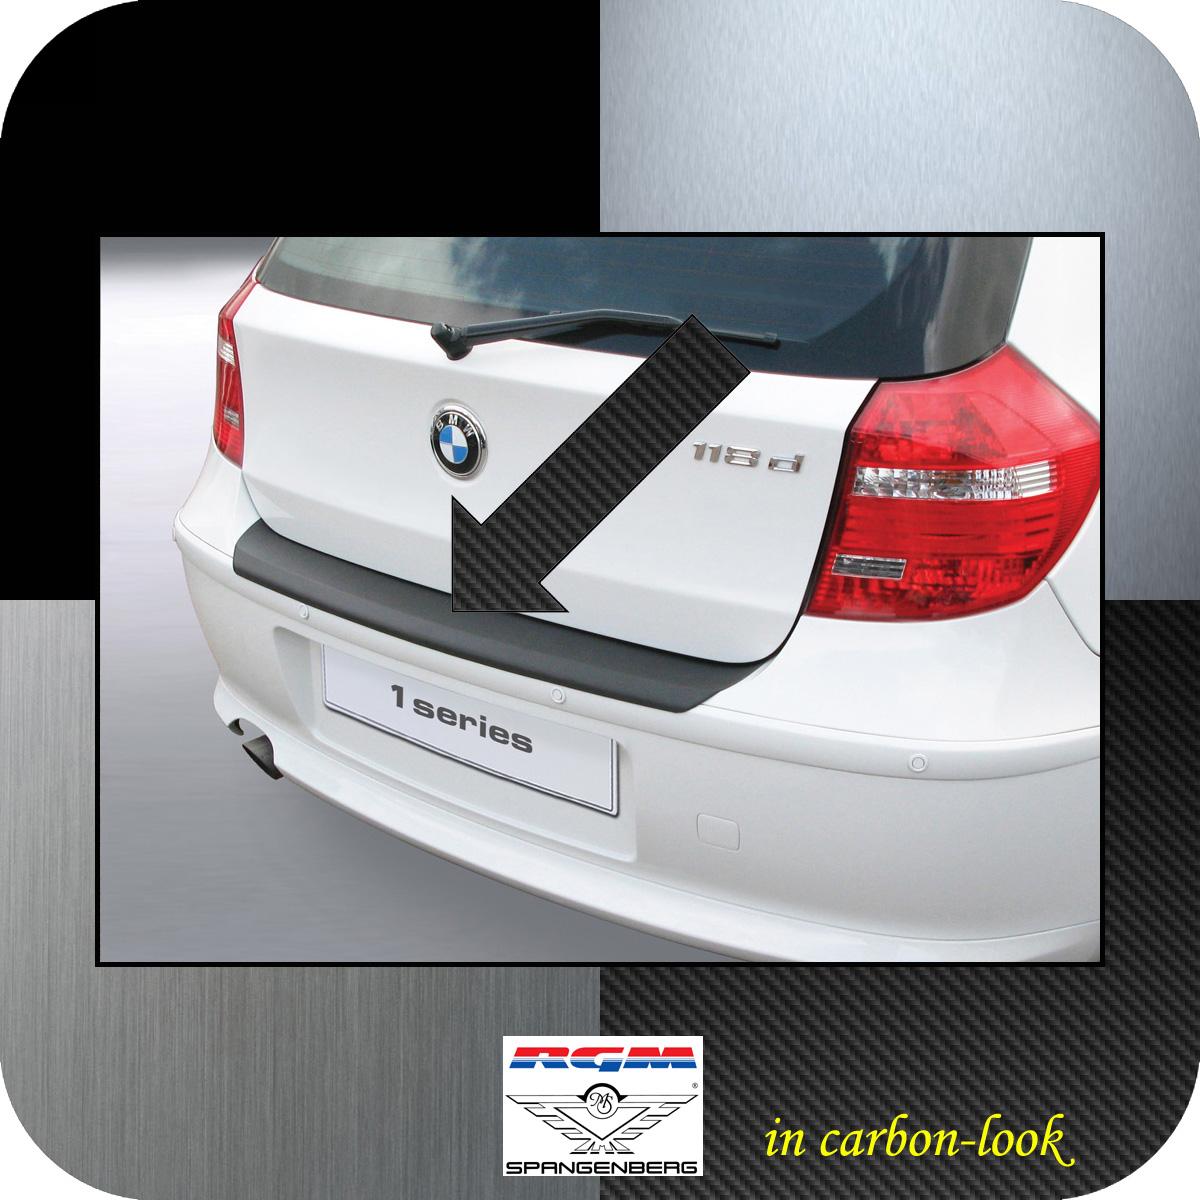 Ladekantenschutz Carbon-Look BMW 1er E81 E87 Schrägheck ab Mopf 2007-12 3509453